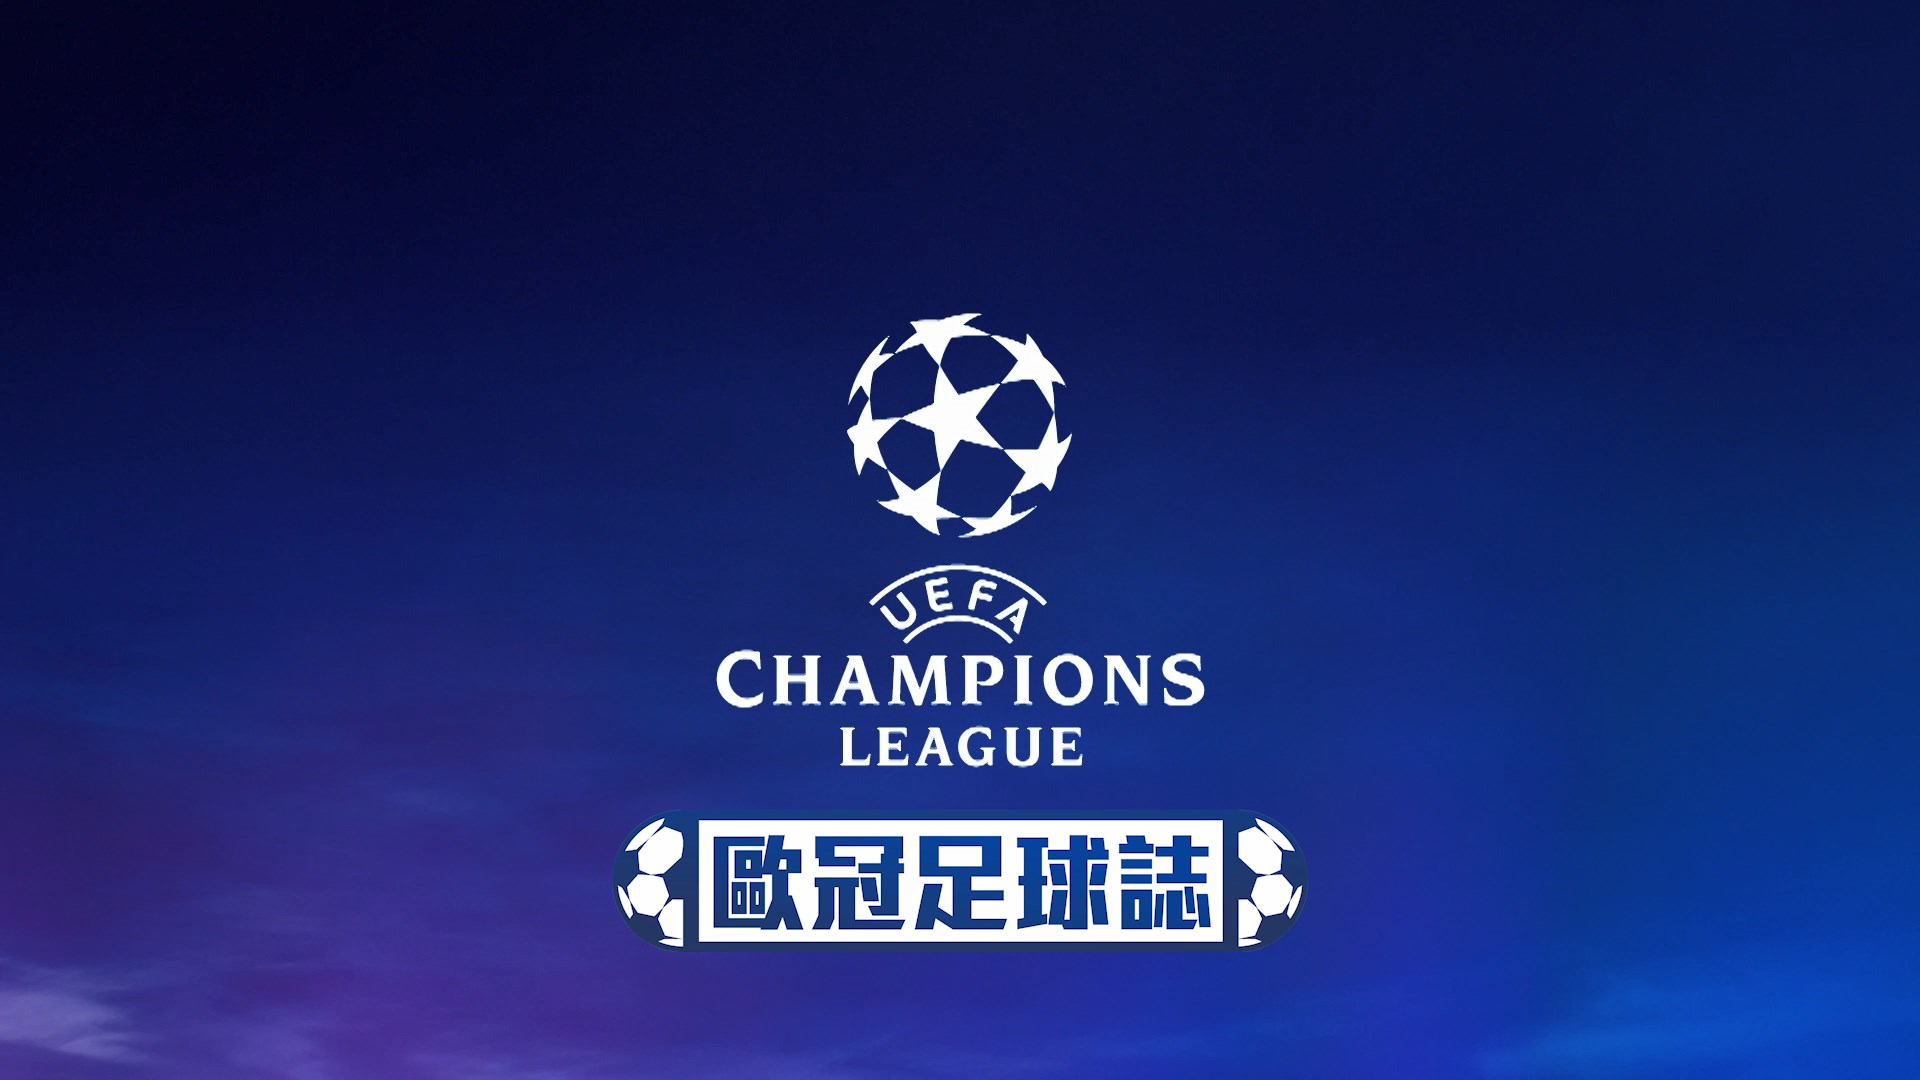 歐冠足球誌 第27集